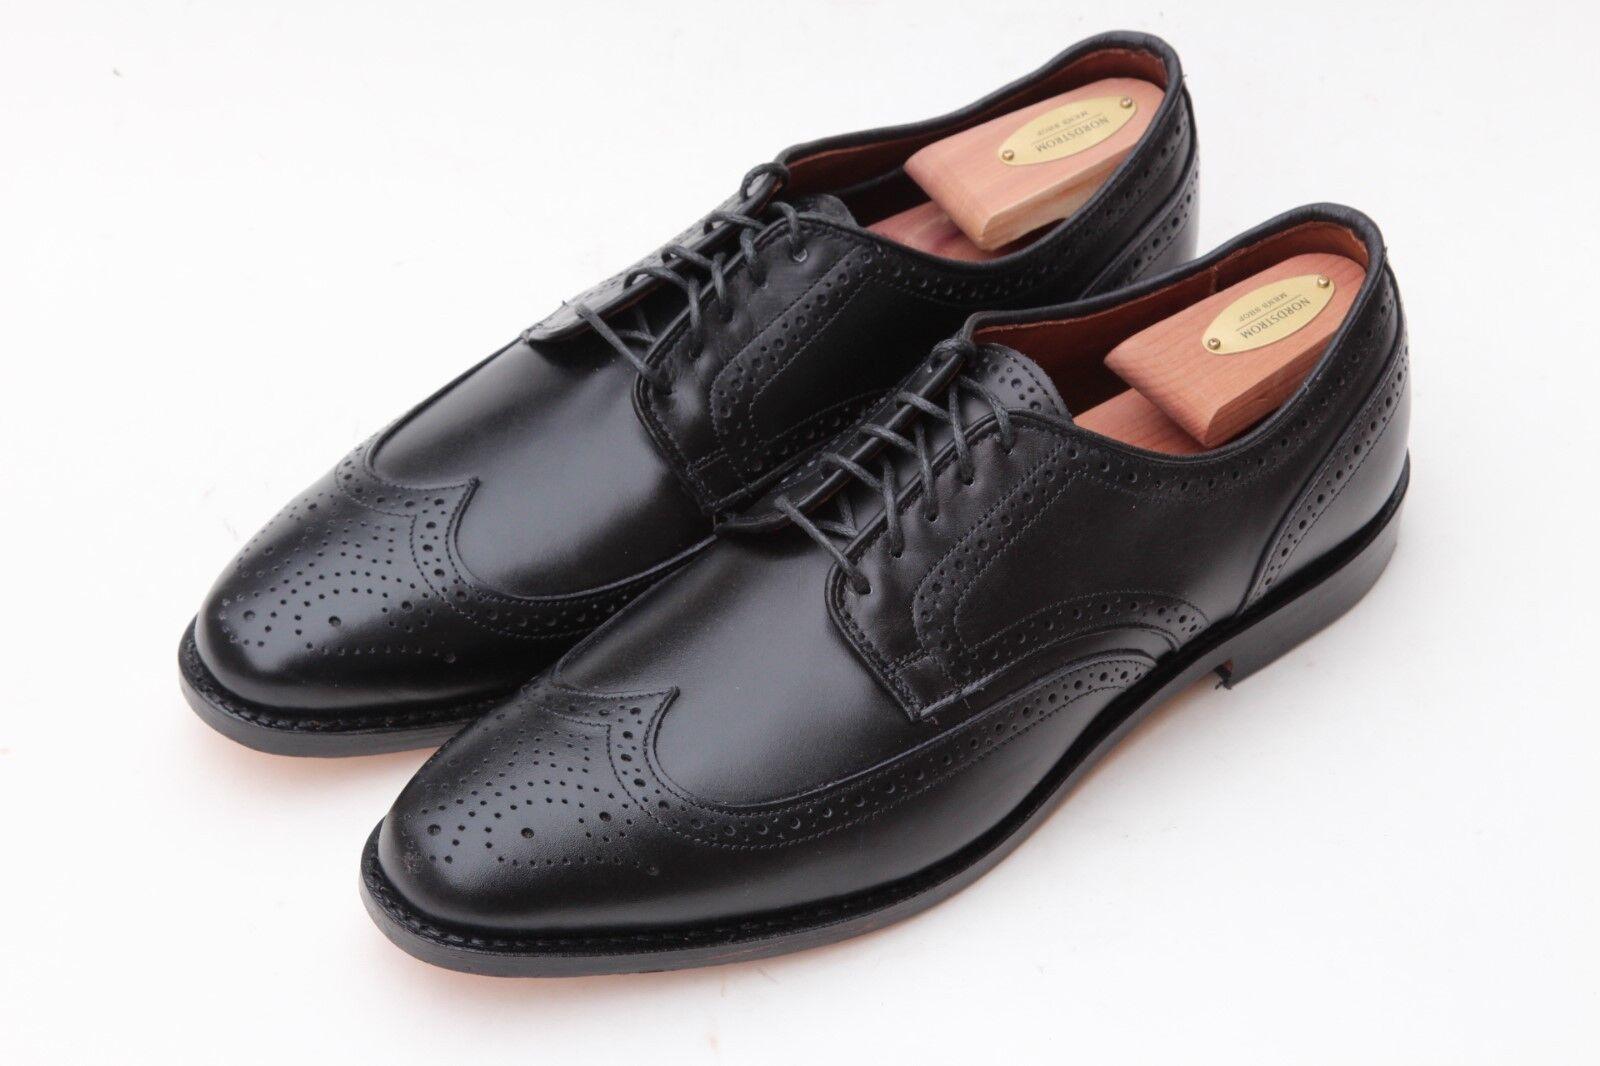 Allen Edmonds 'Stuttgart' Black Wingtip bluecher Oxford shoes Size 11 D  395